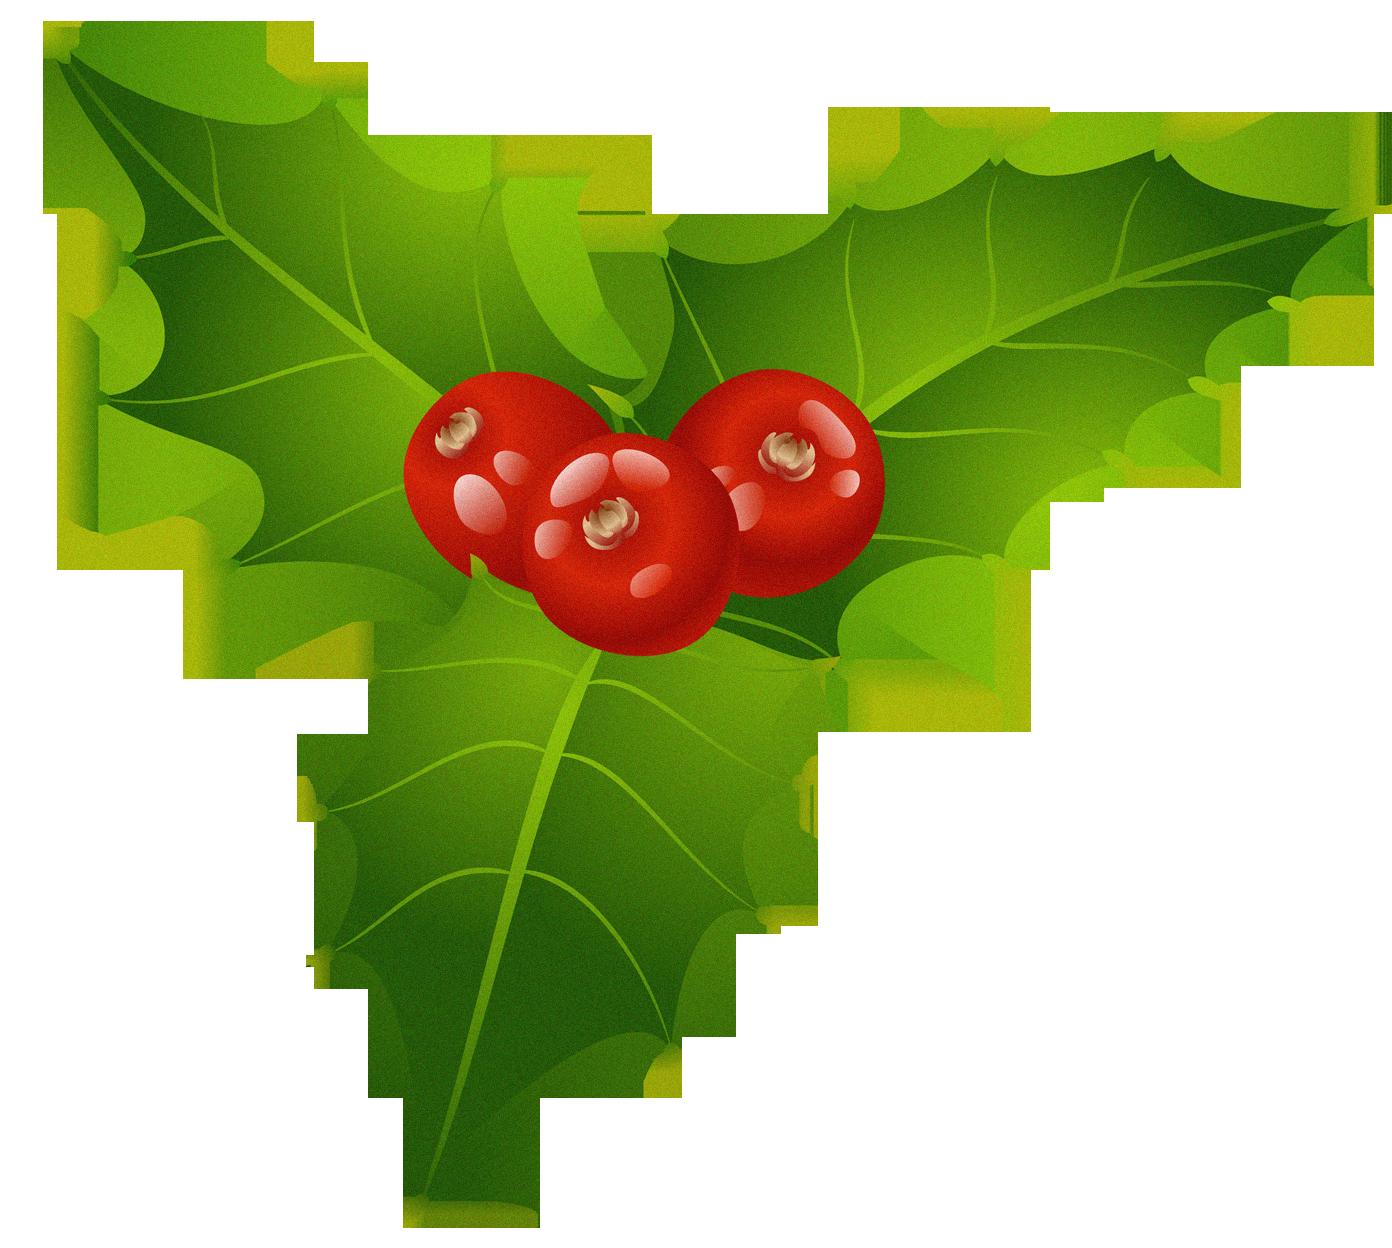 Christmas mistletoe clipart image free download Christmas Mistletoe PNG Clipart | Christmas:Sticker | Pinterest ... image free download